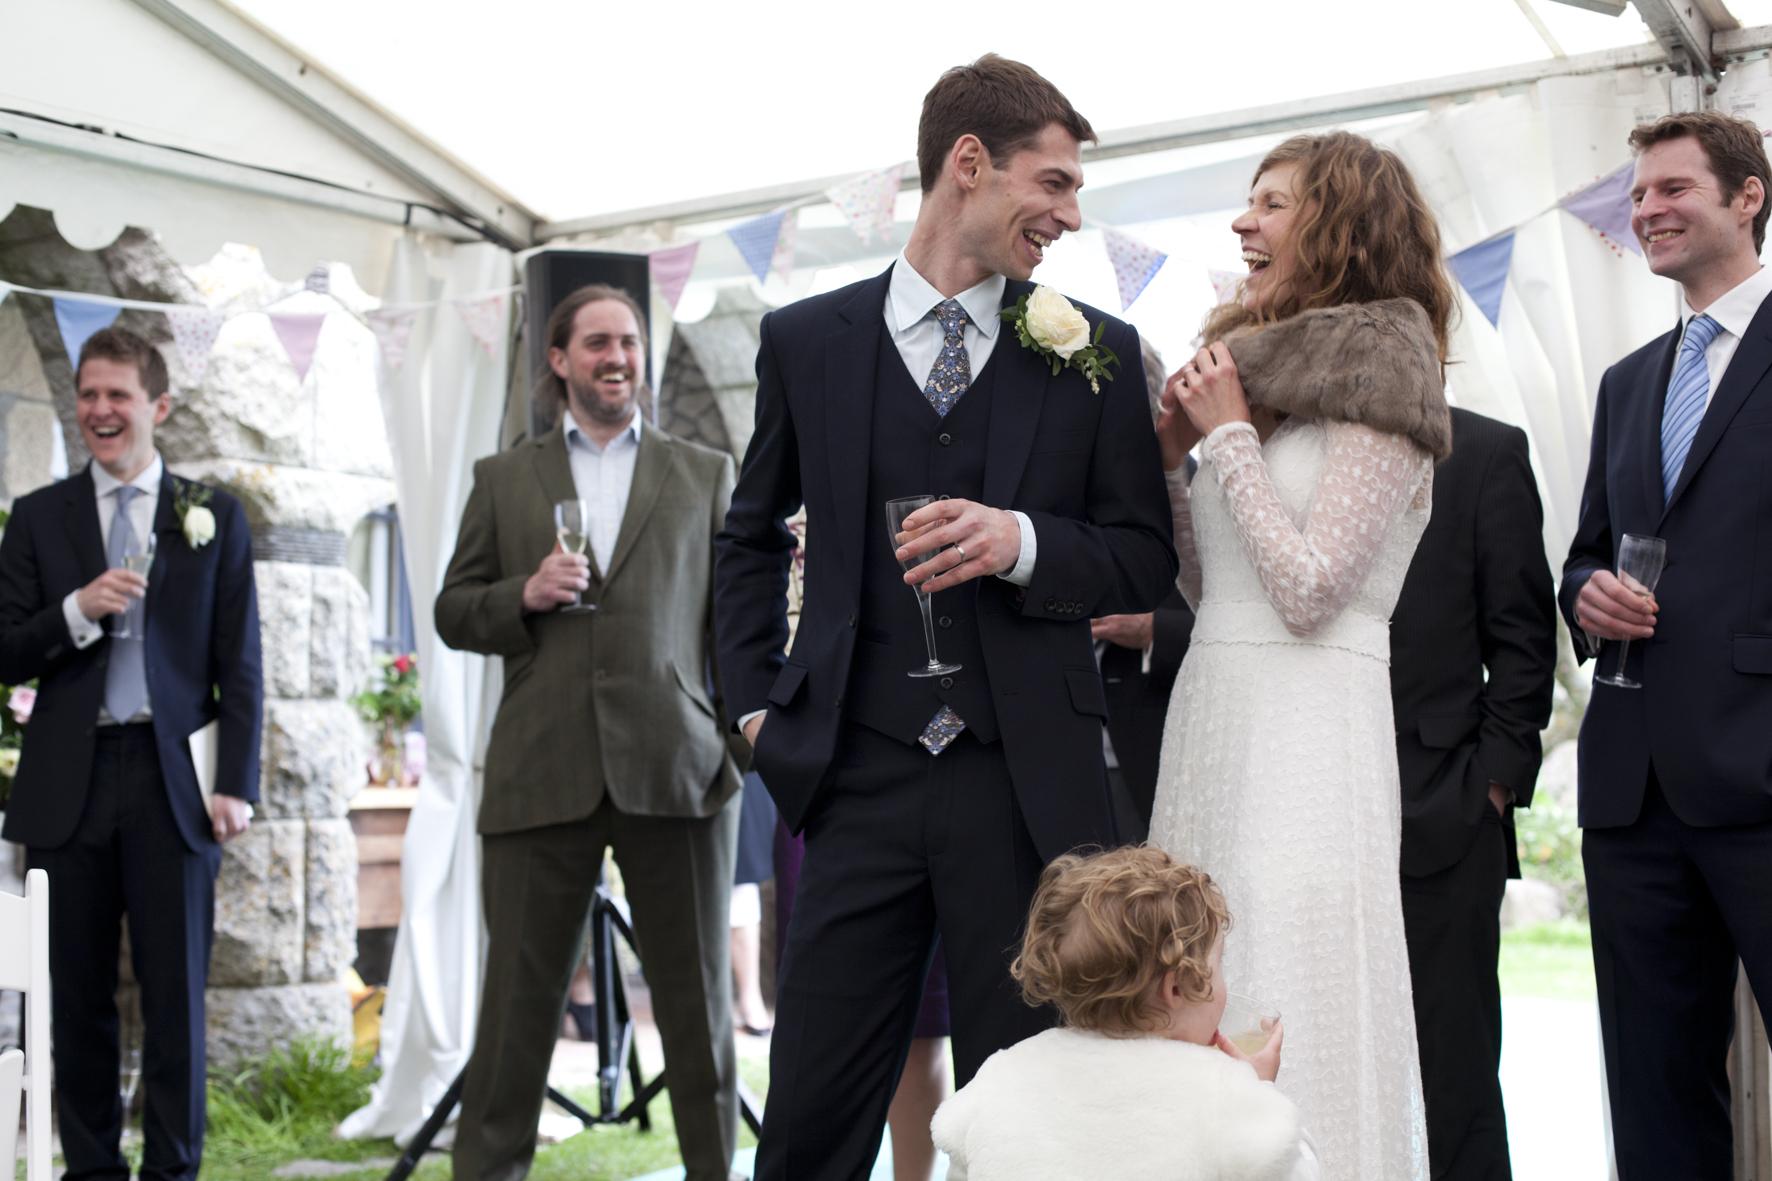 Wedding example_M&P__MG_3978_Claudia Leisinger.jpg